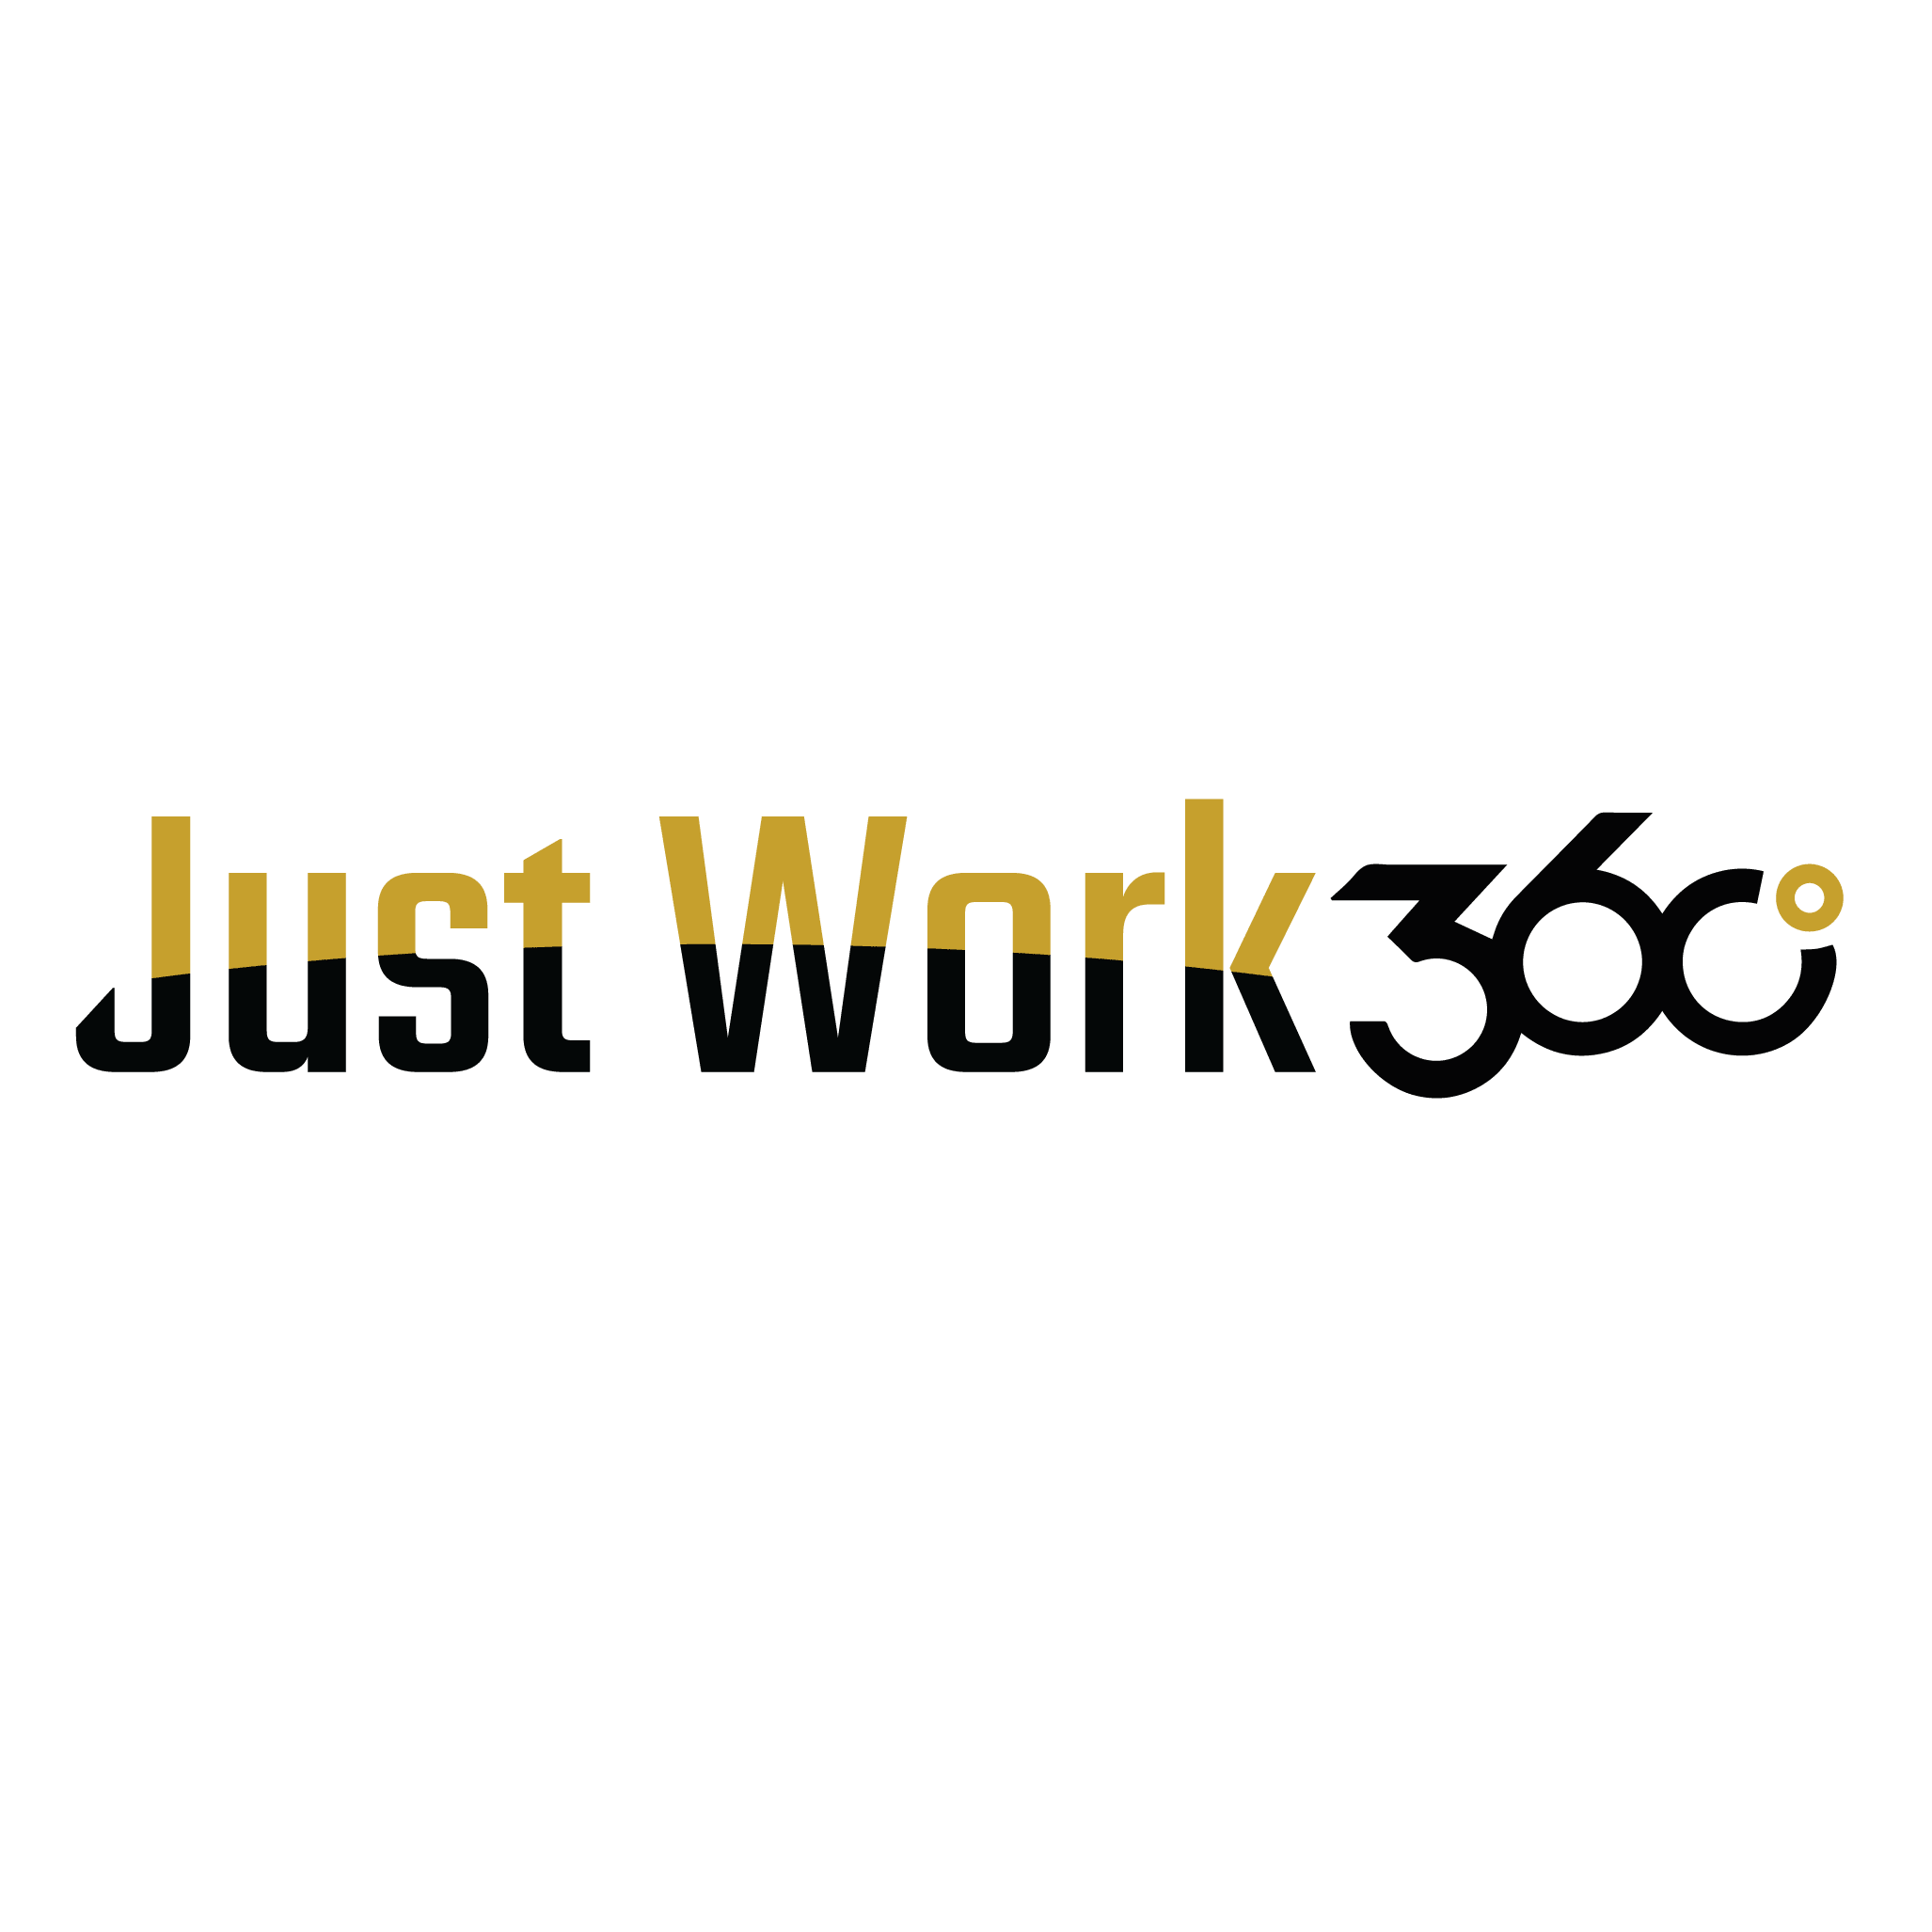 Just Work 360